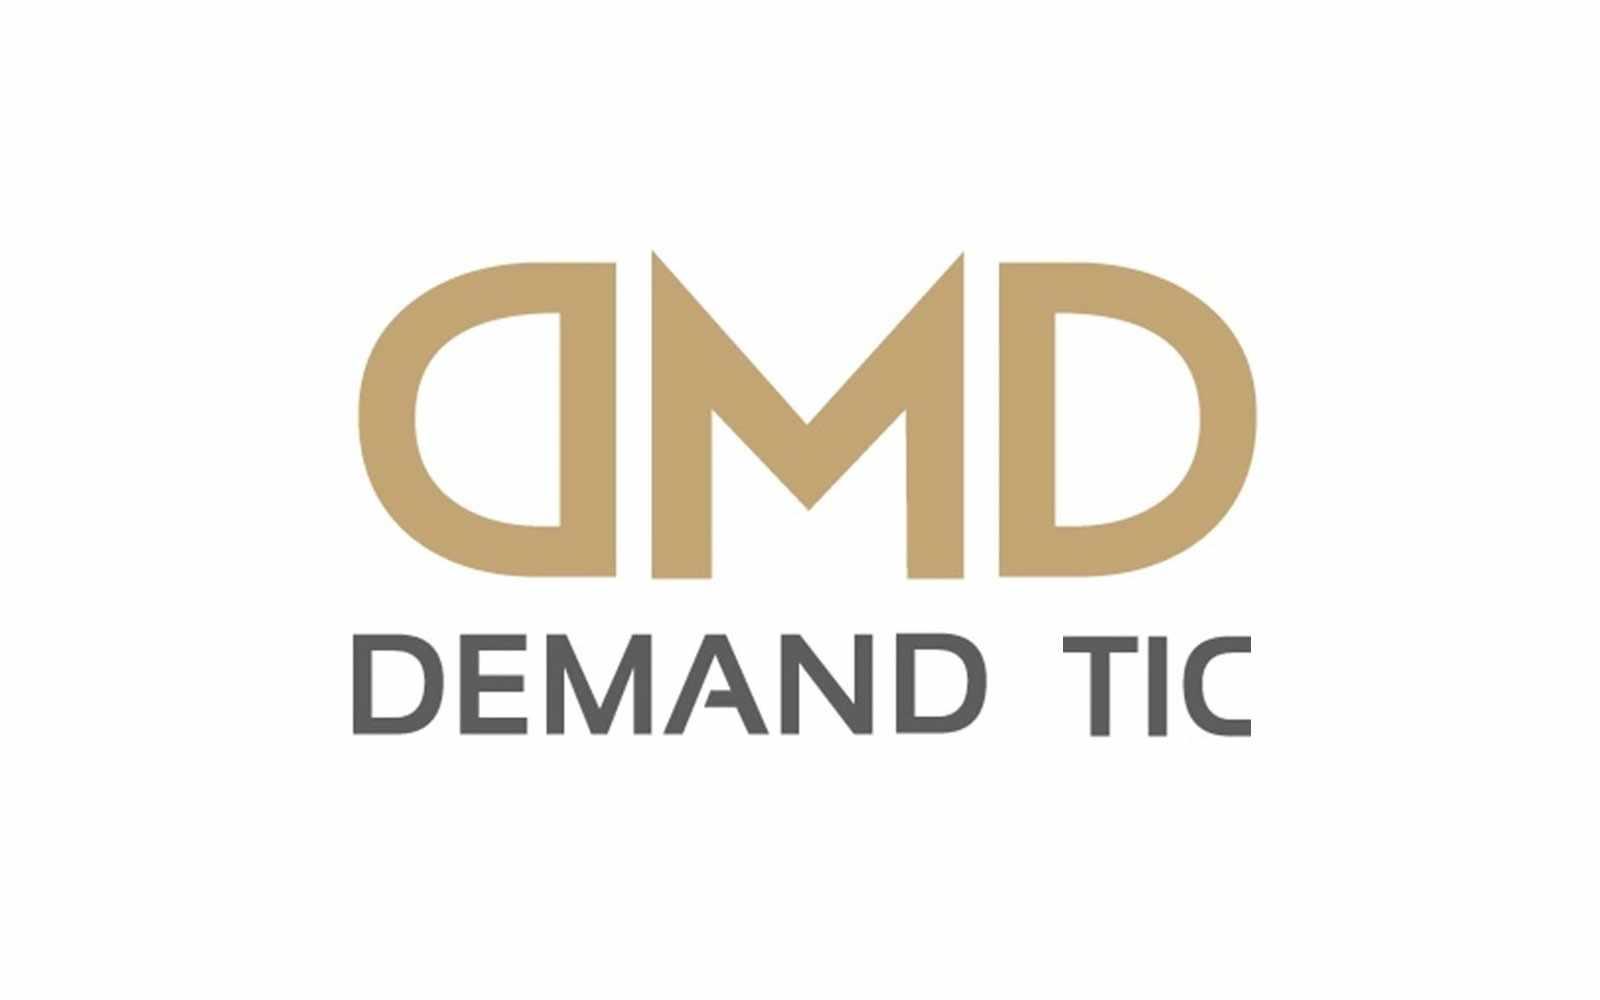 Demand Tic logo